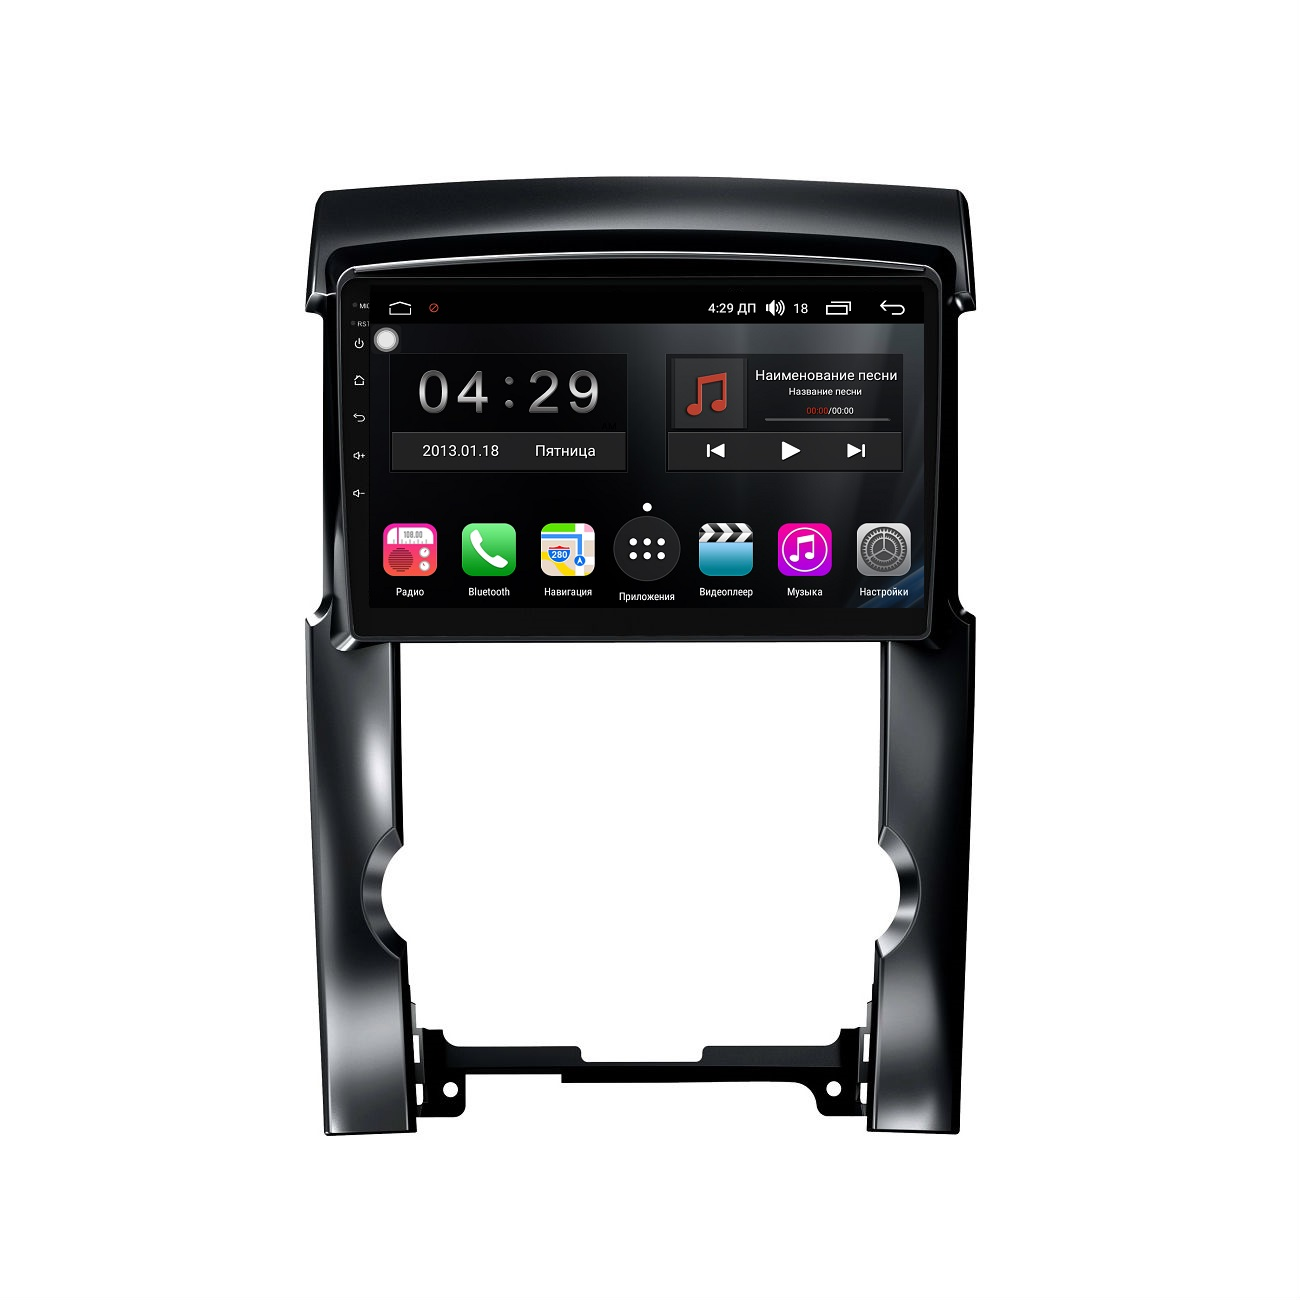 Штатная магнитола FarCar s300 для KIA Sorento 2010-2012 на Android (RL041R) штатная магнитола для kia sportage iii 2010 2016 letrun 2020 android 6 0 1